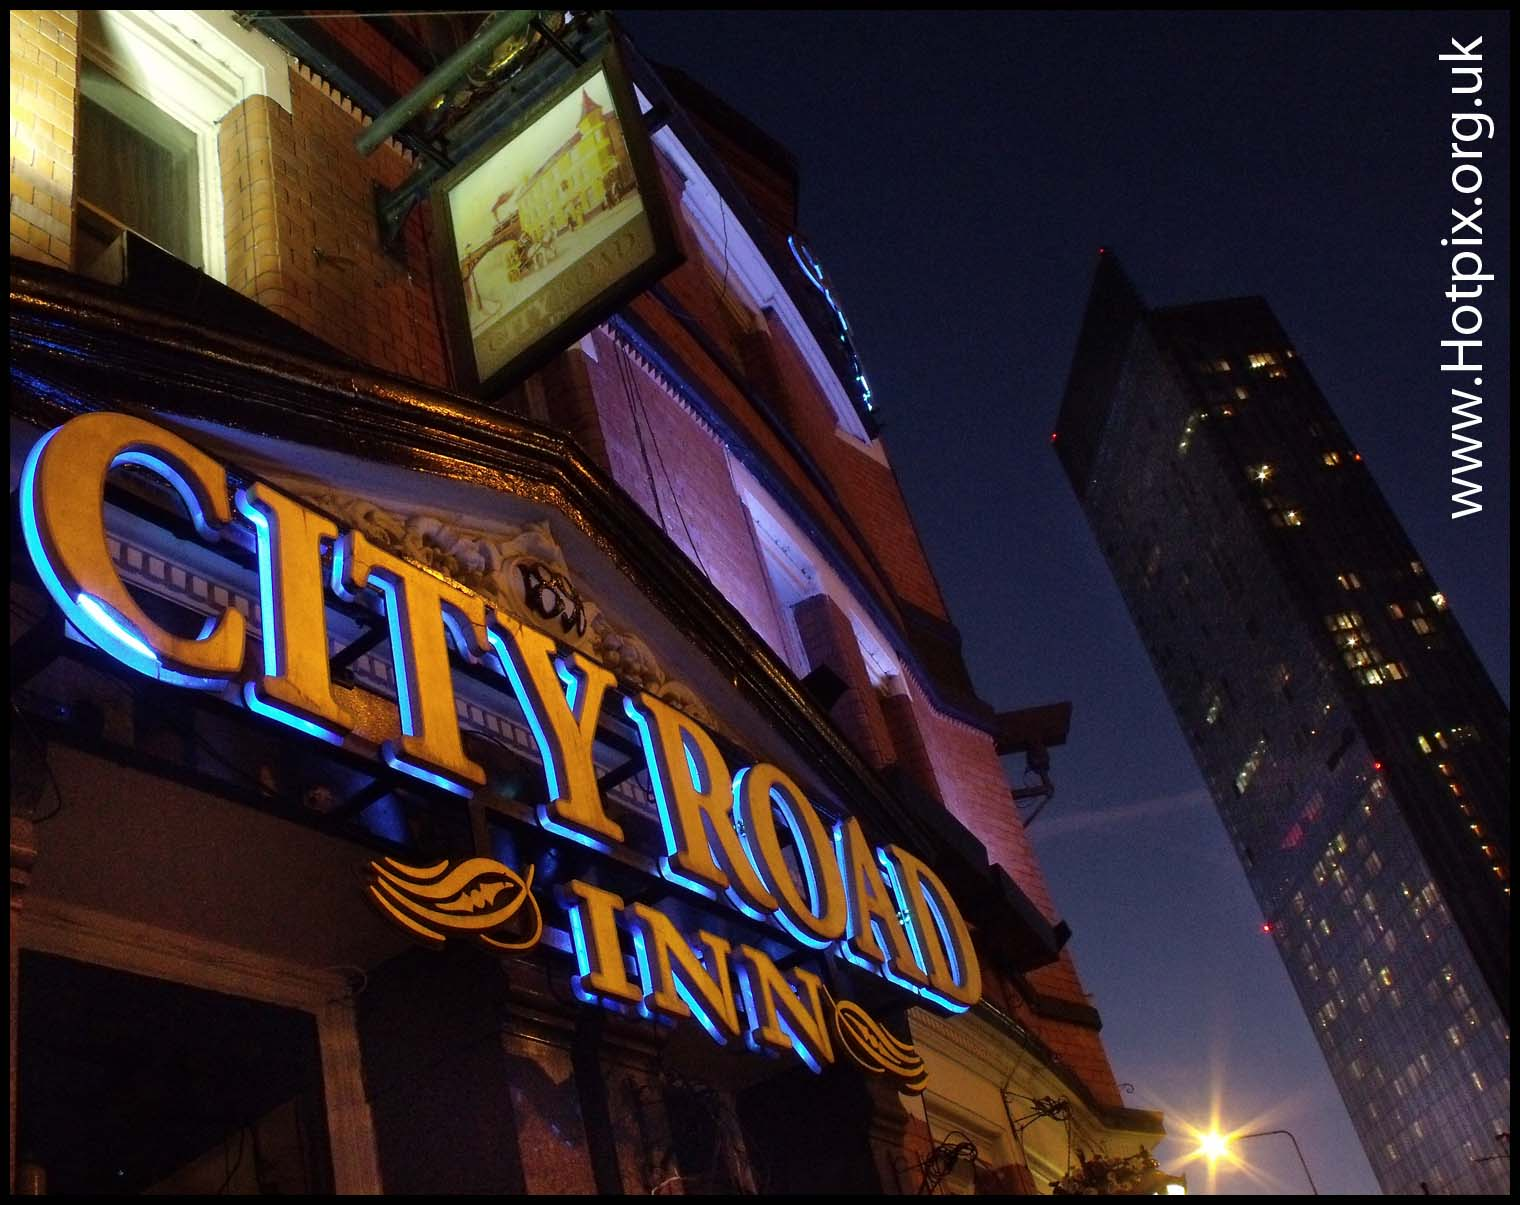 pub,manchester,city,centre,dusk,night,shot,tony,smith,tonysmith golden,hour,blue,bluehour,goldenhour pub,tonysmith,hotpix,hot,pics,picks,pix,tonysmithhotpix,#tonysmithotpix